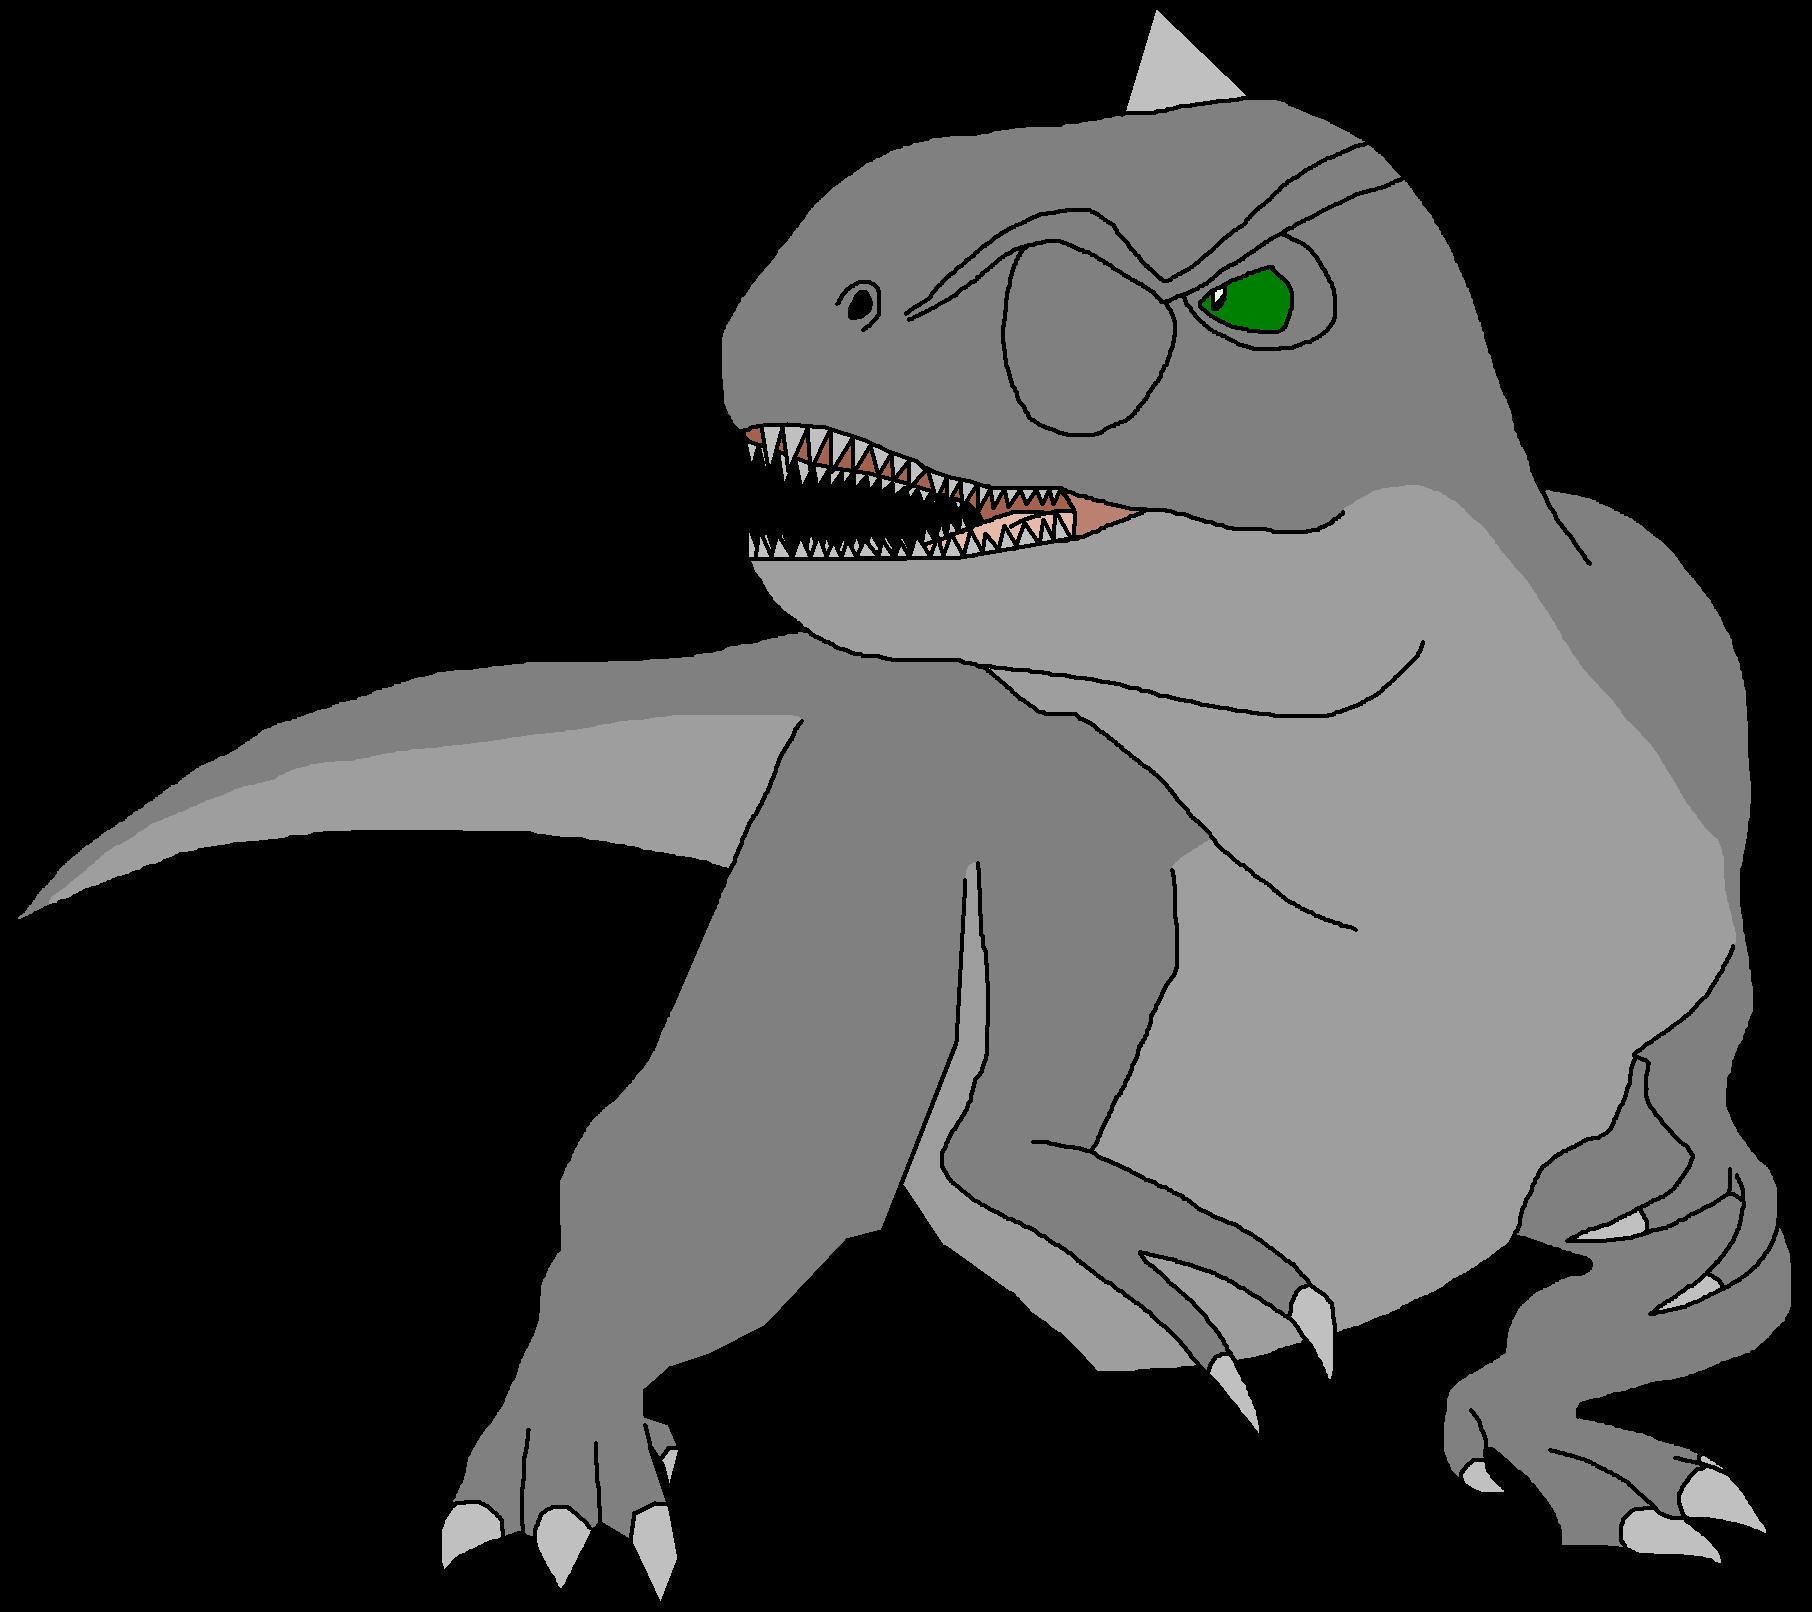 1812x1612 jurassic world the gameattle arena dinosaur pedia wikia